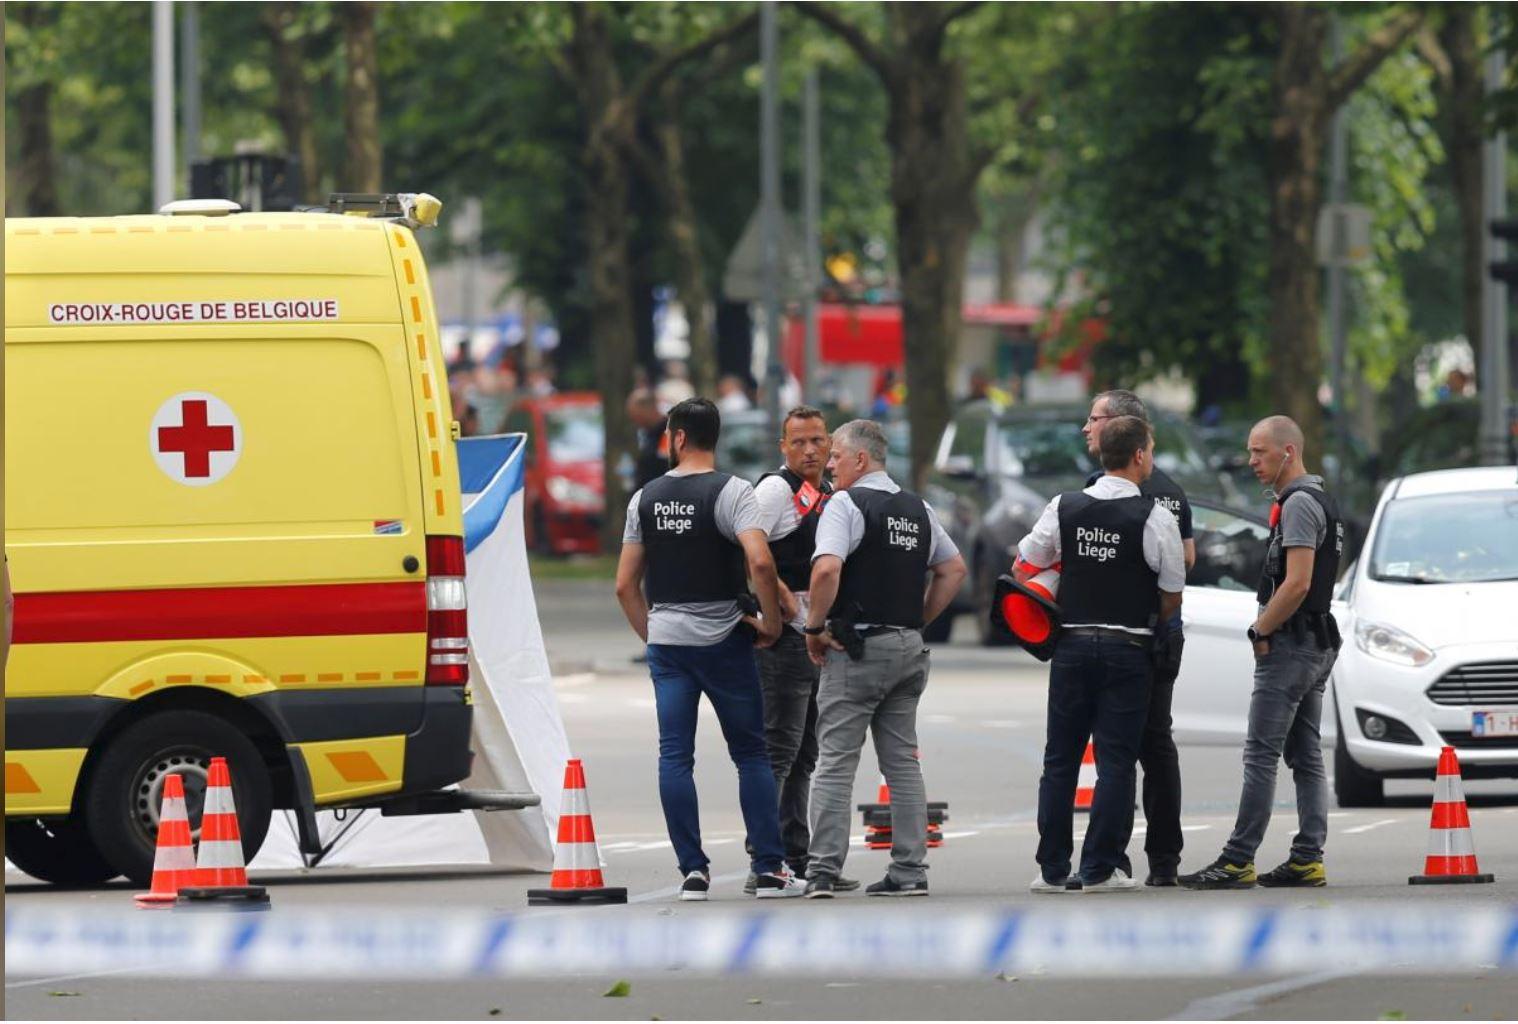 Attacker kills 2 police and 1 civilian in Belgium shooting